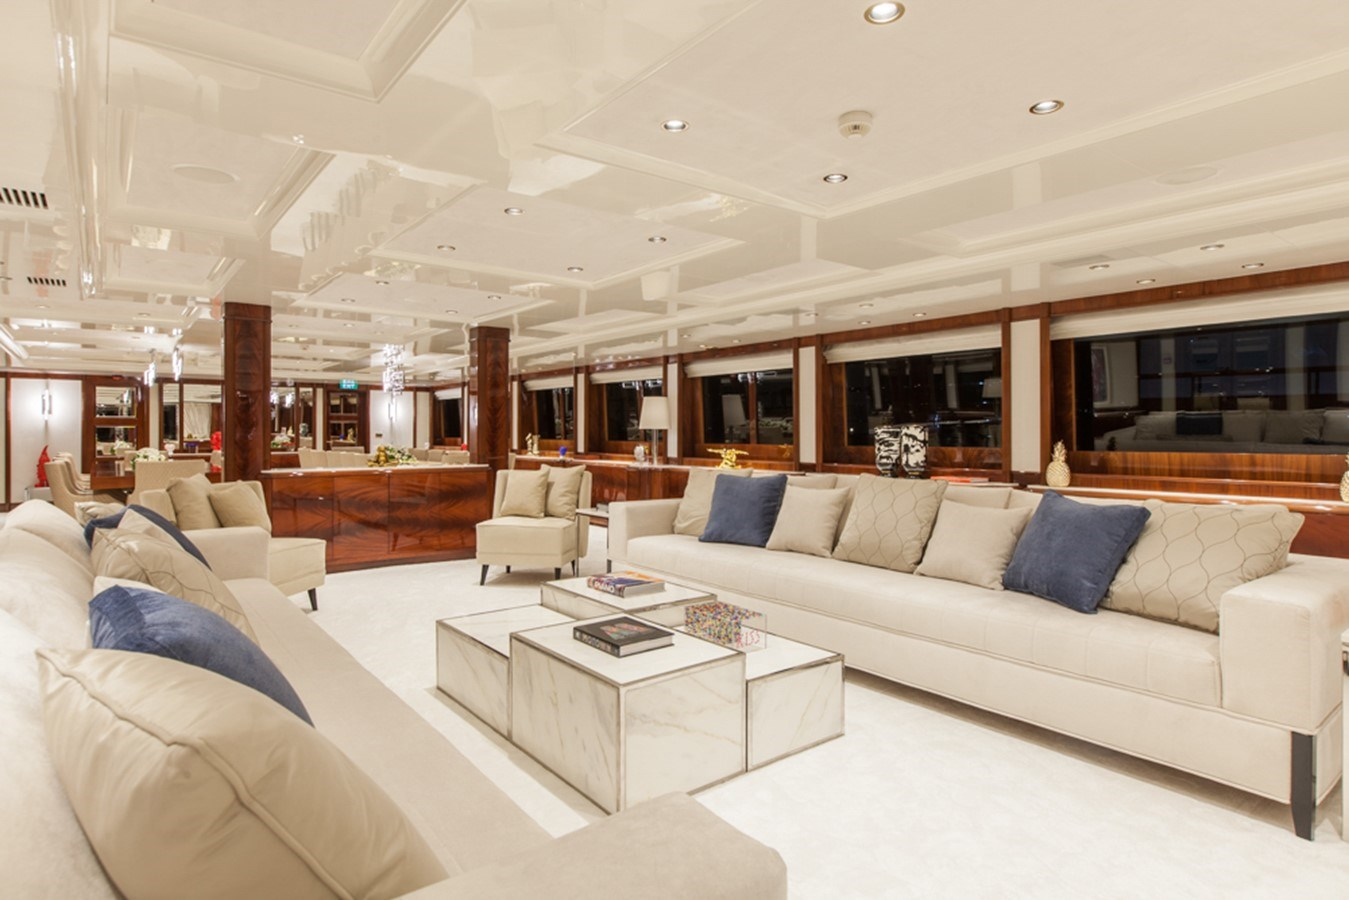 004 O'Mega_271- main salon  large_2161838 2004 MITSUBISHI  Mega Yacht 2919758